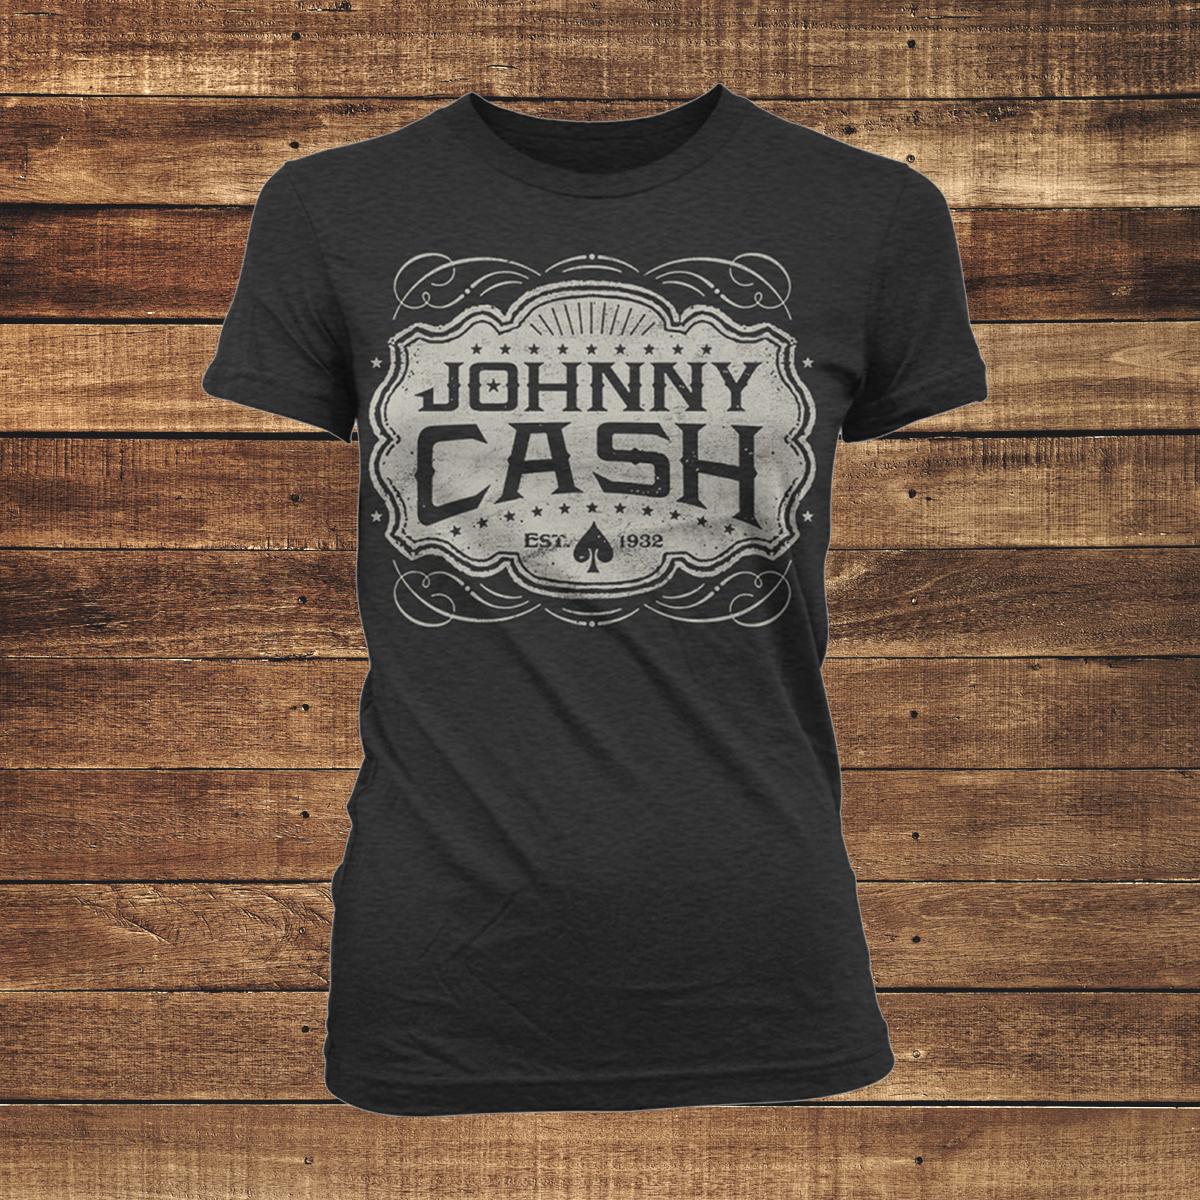 Johnny Cash Emblem Women's T-Shirt